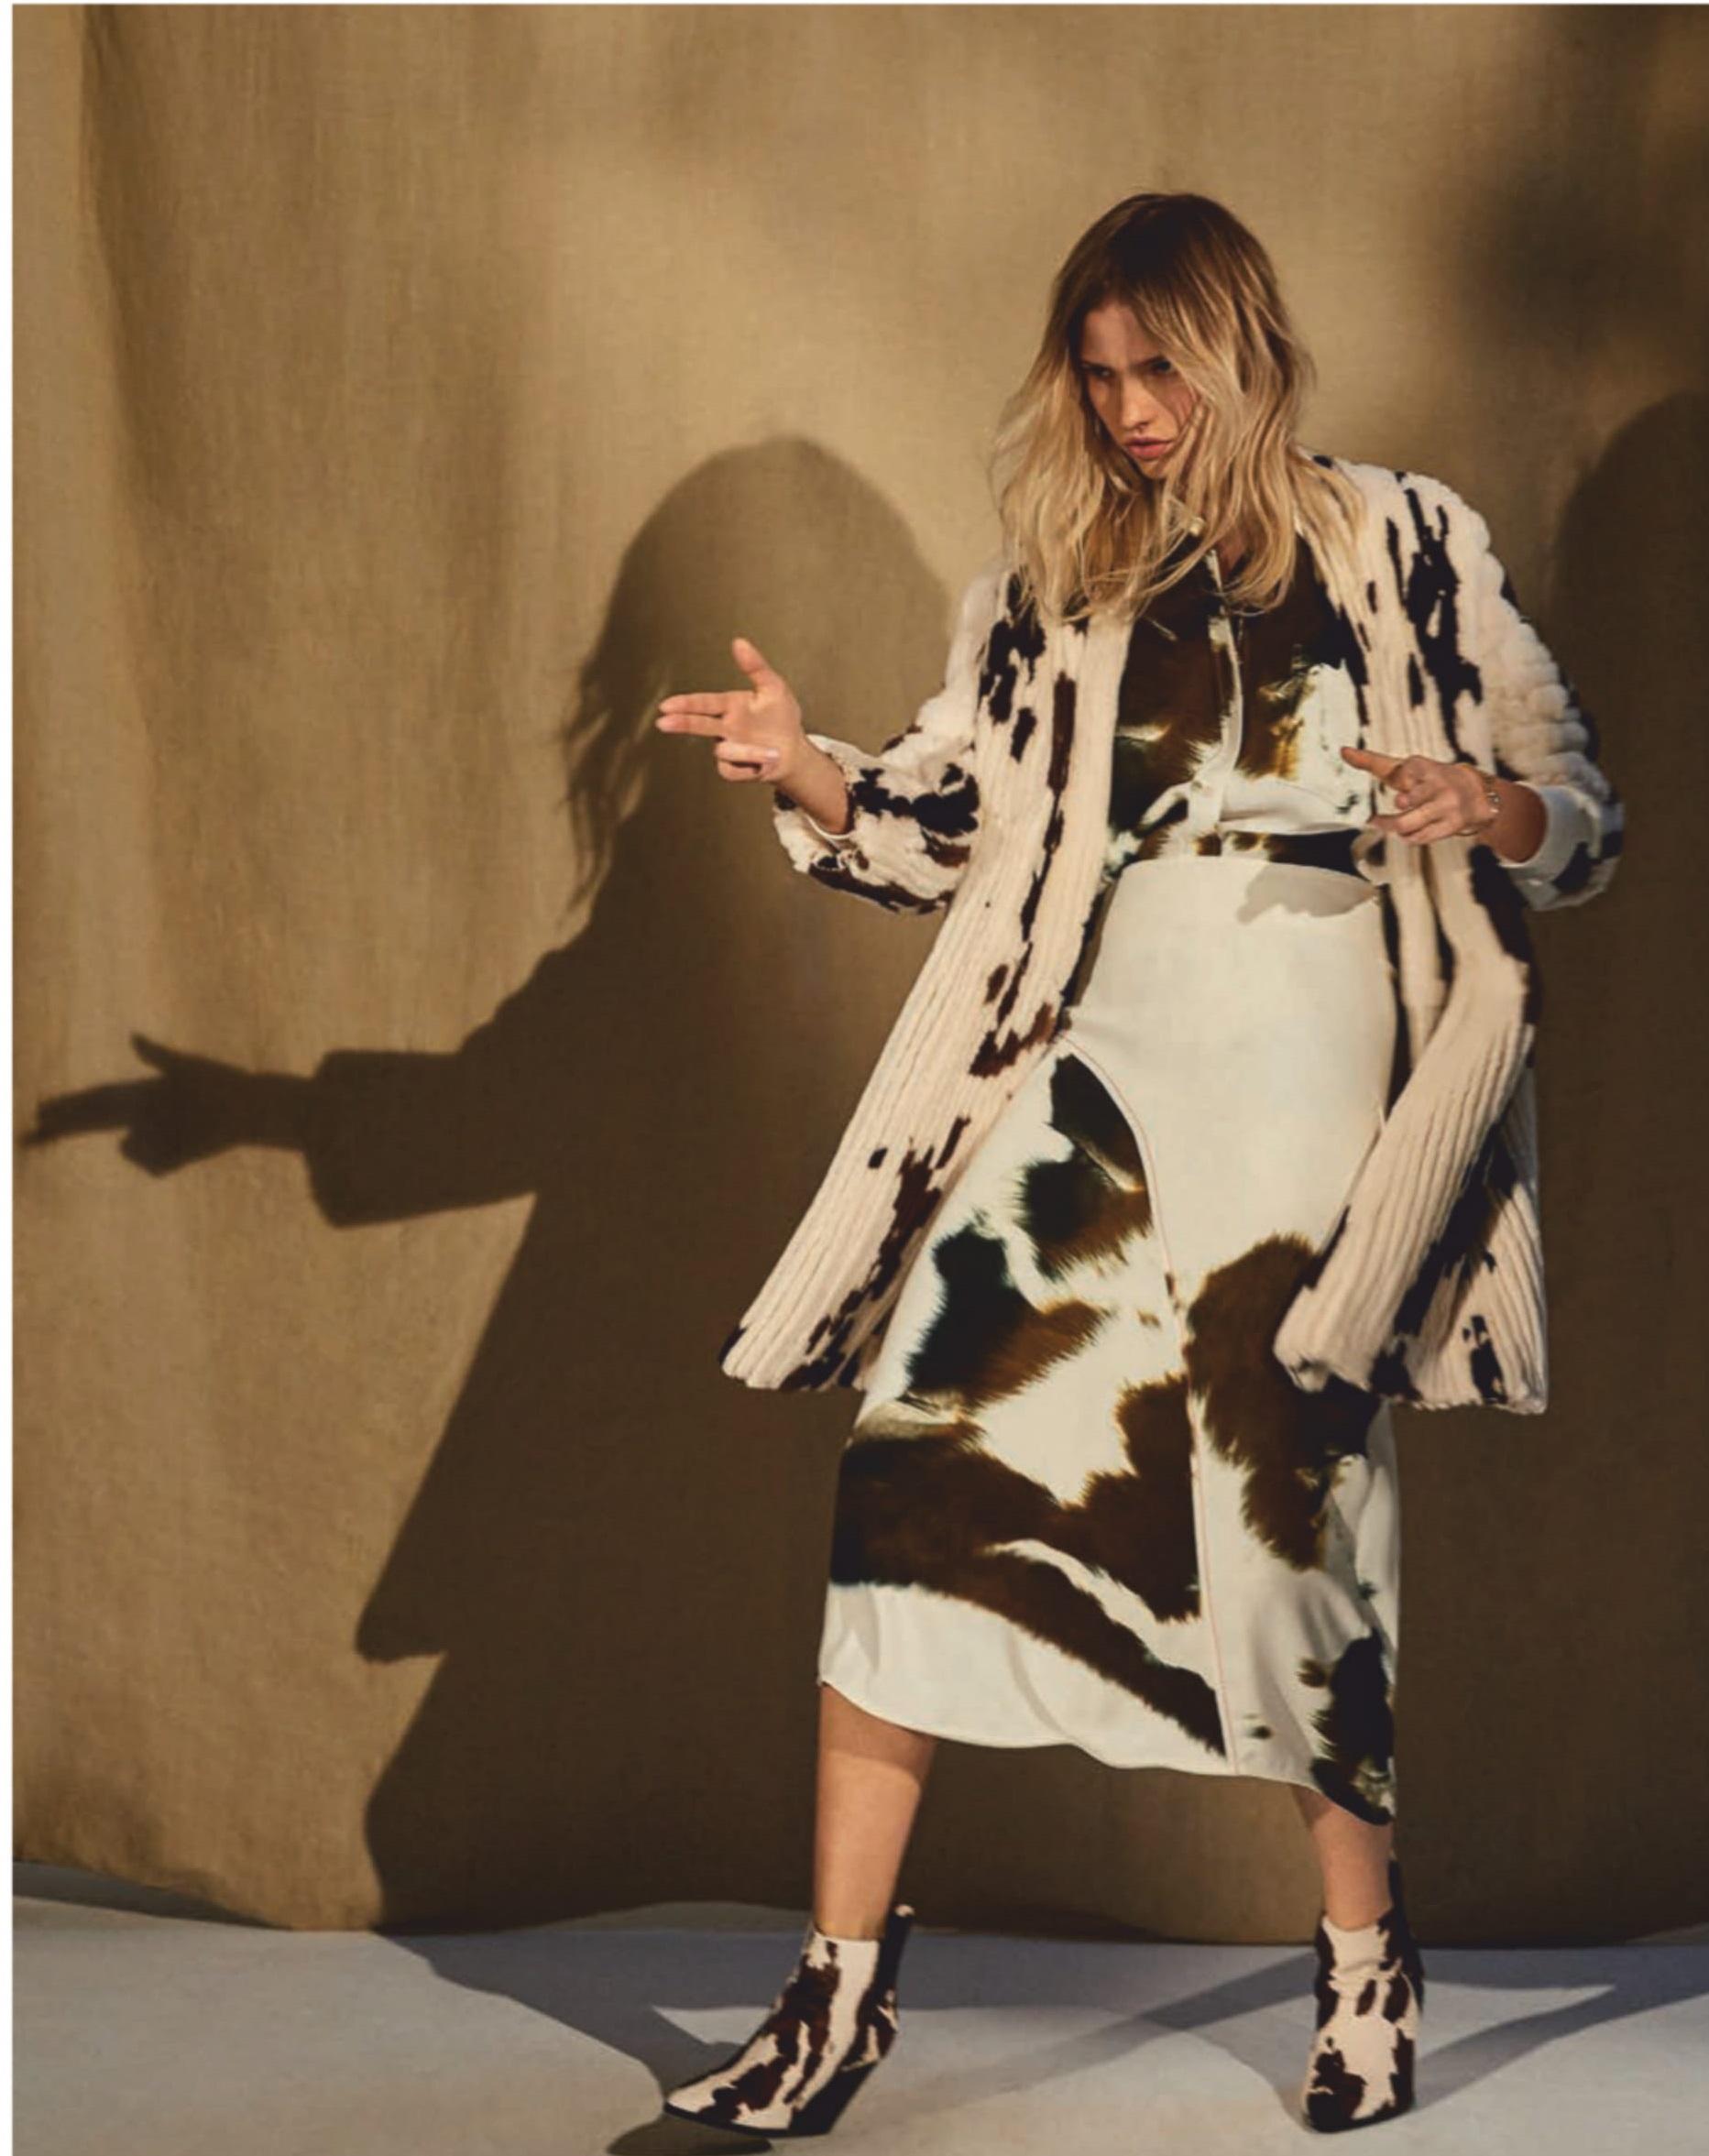 Sasha Luss by Gorka Postigo for Vogue Spain March 2019 (5).jpg